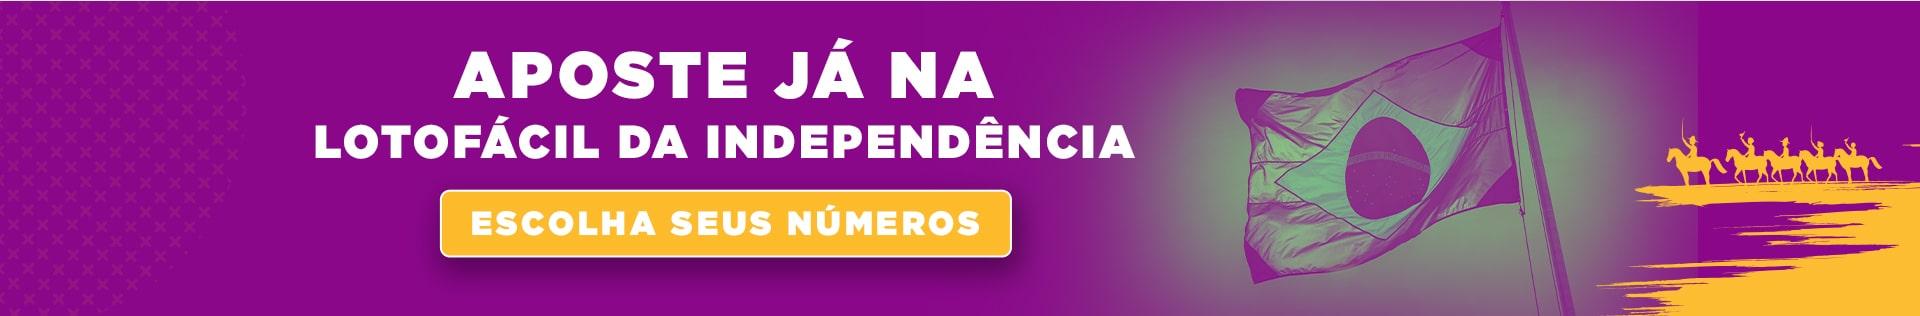 Aposte Já na Lotofácil da Independência